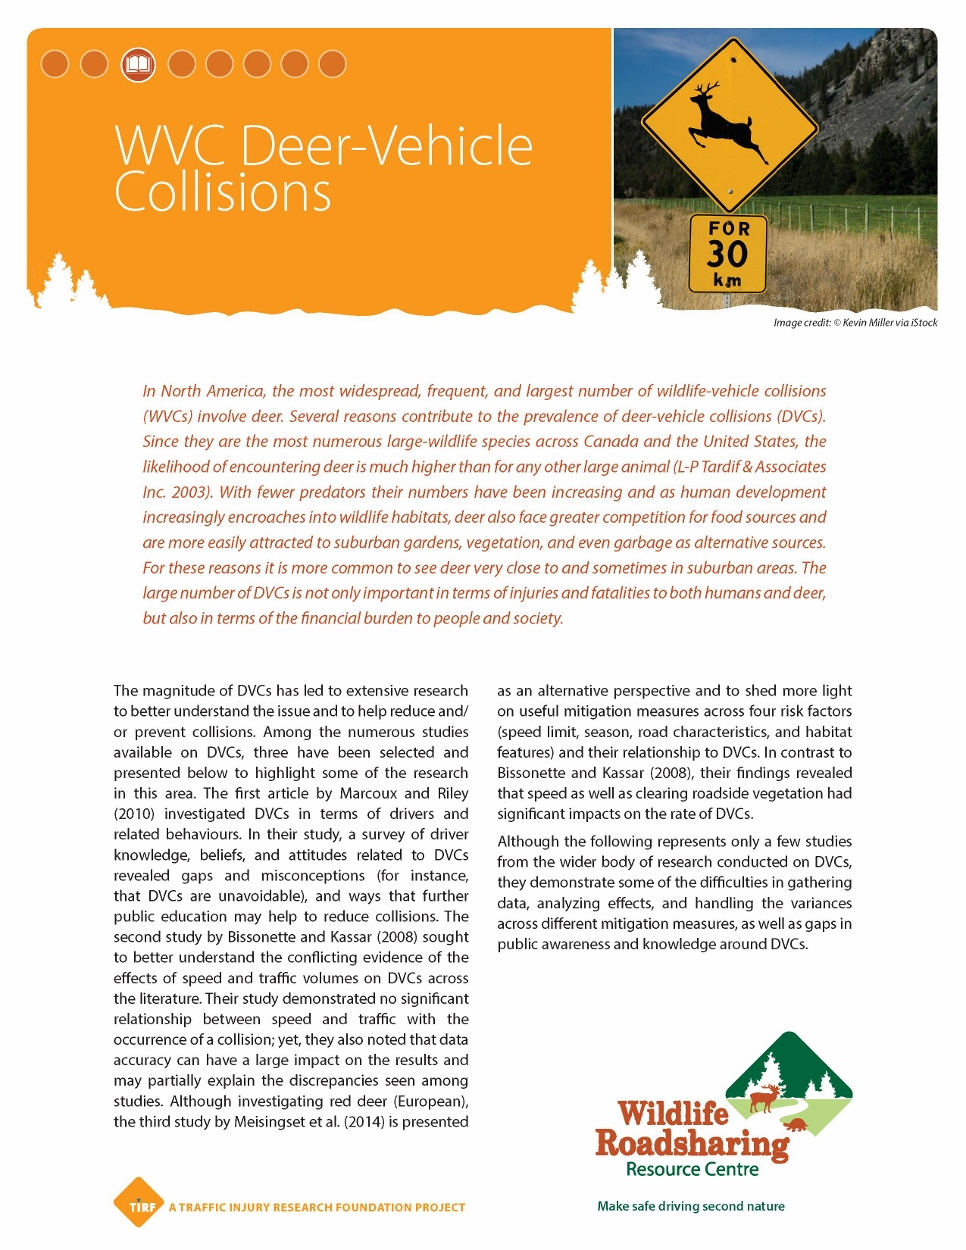 WVC Deer-Vehicle CollisionsResearch Handout